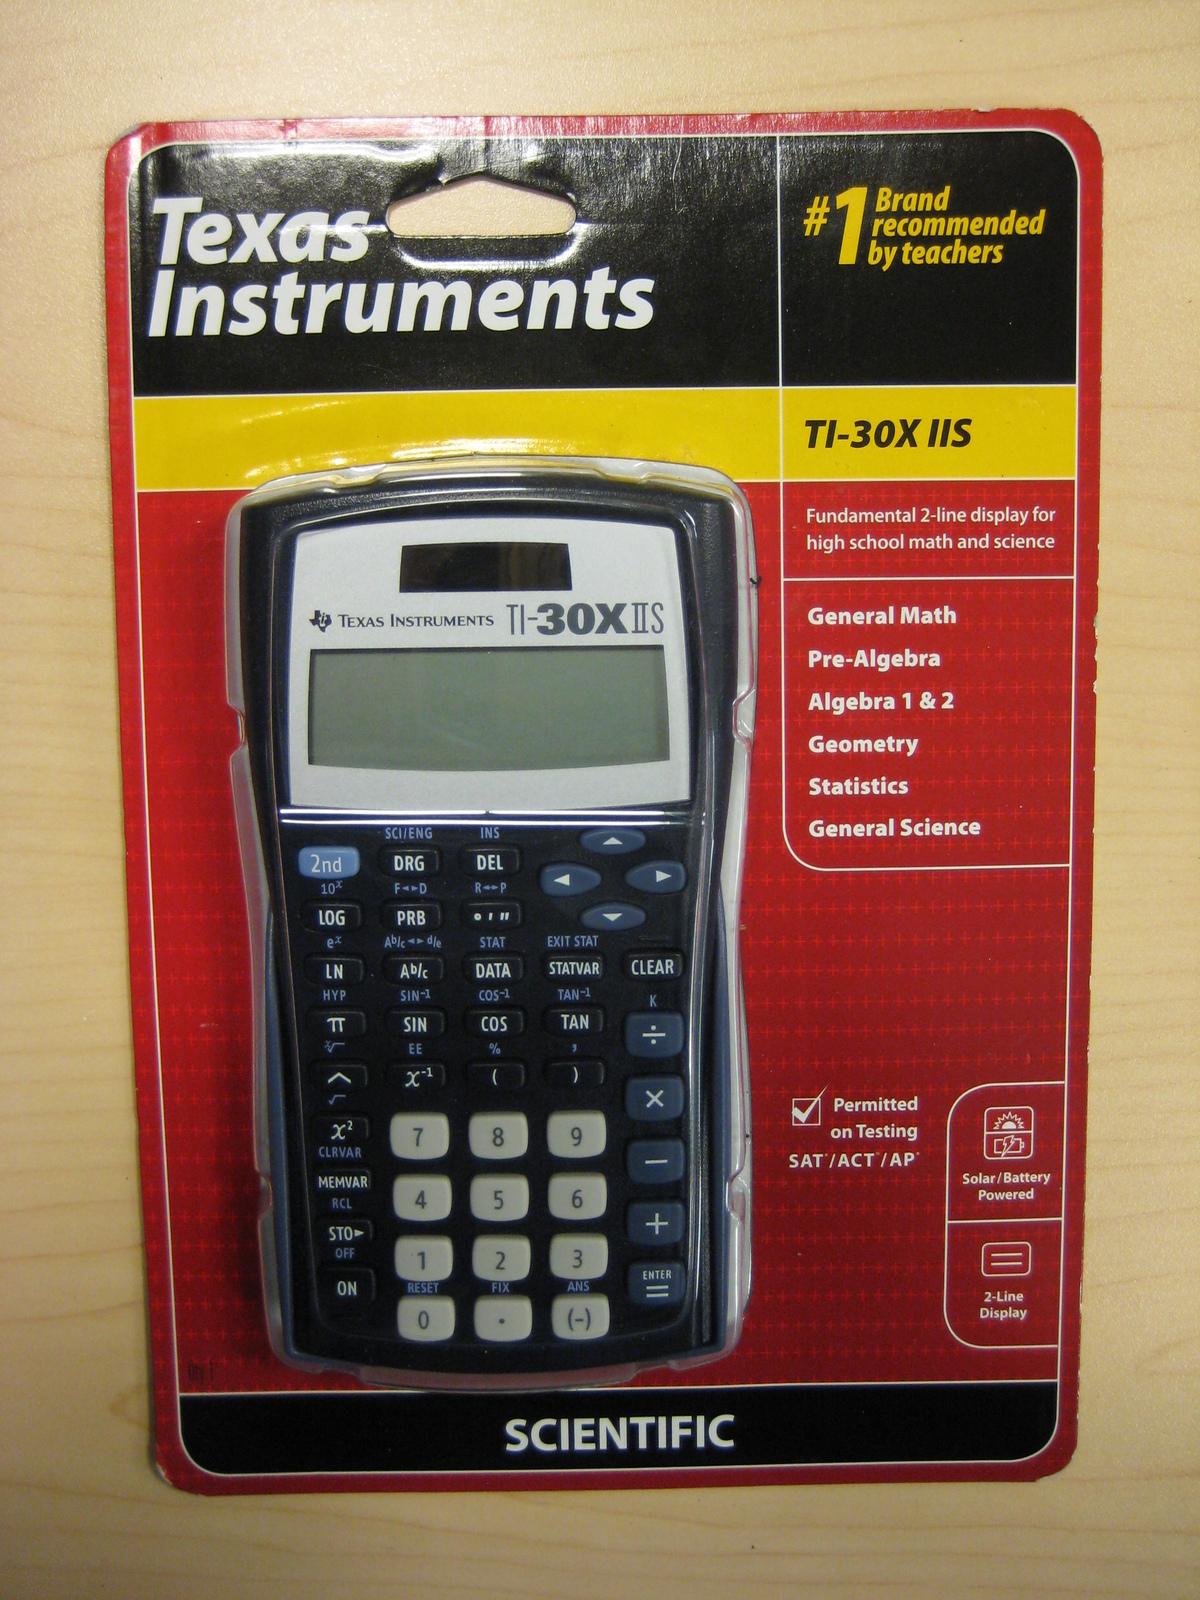 077. 077. Texas Instruments TI-30X IIS ...